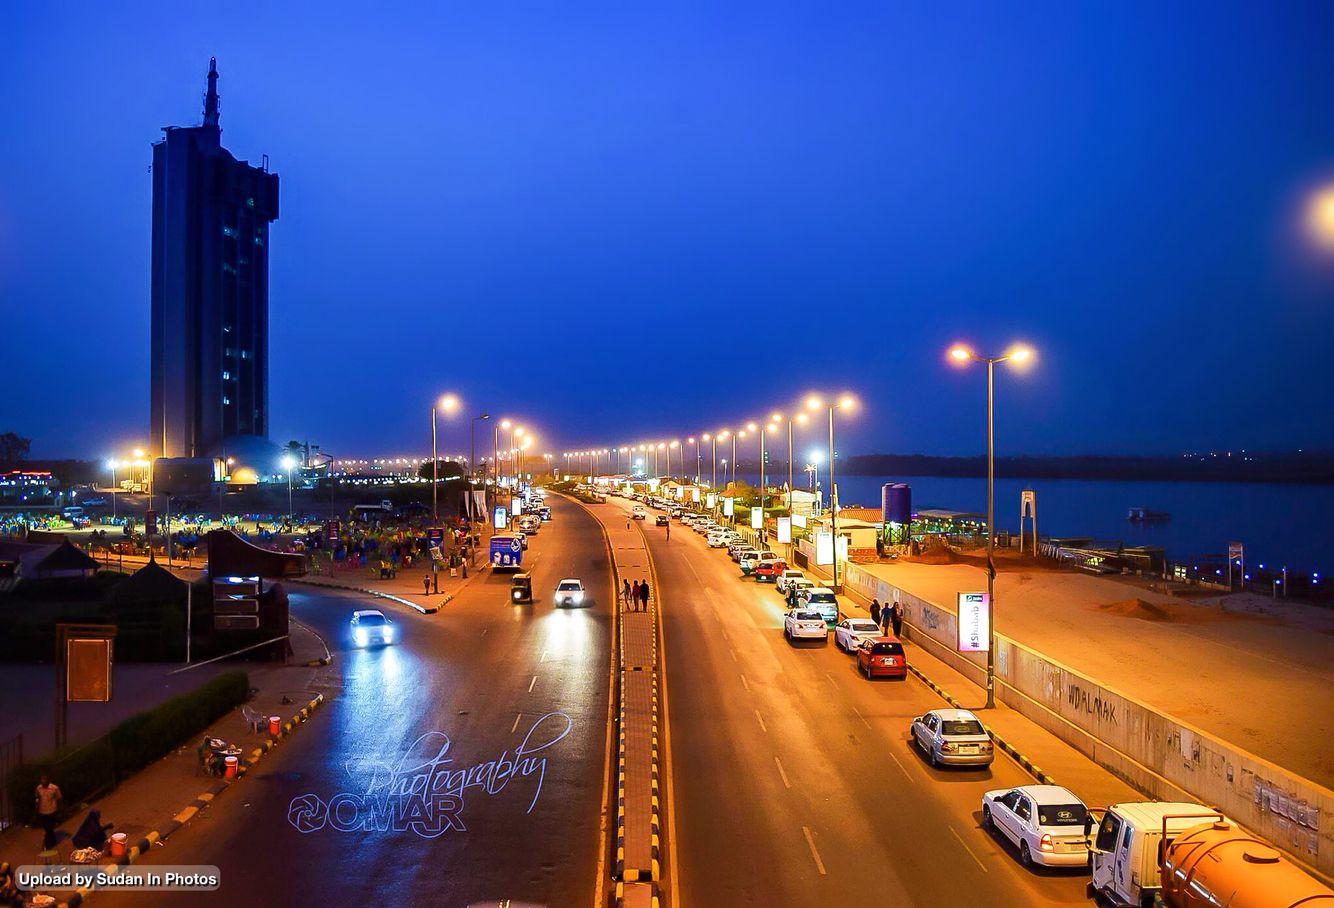 Nile Street At Night Khartoum شارع النيل ليلا الخرطوم السودان By Omar Photography Sudan Khartoum Nil Around The Worlds Photo Sudan